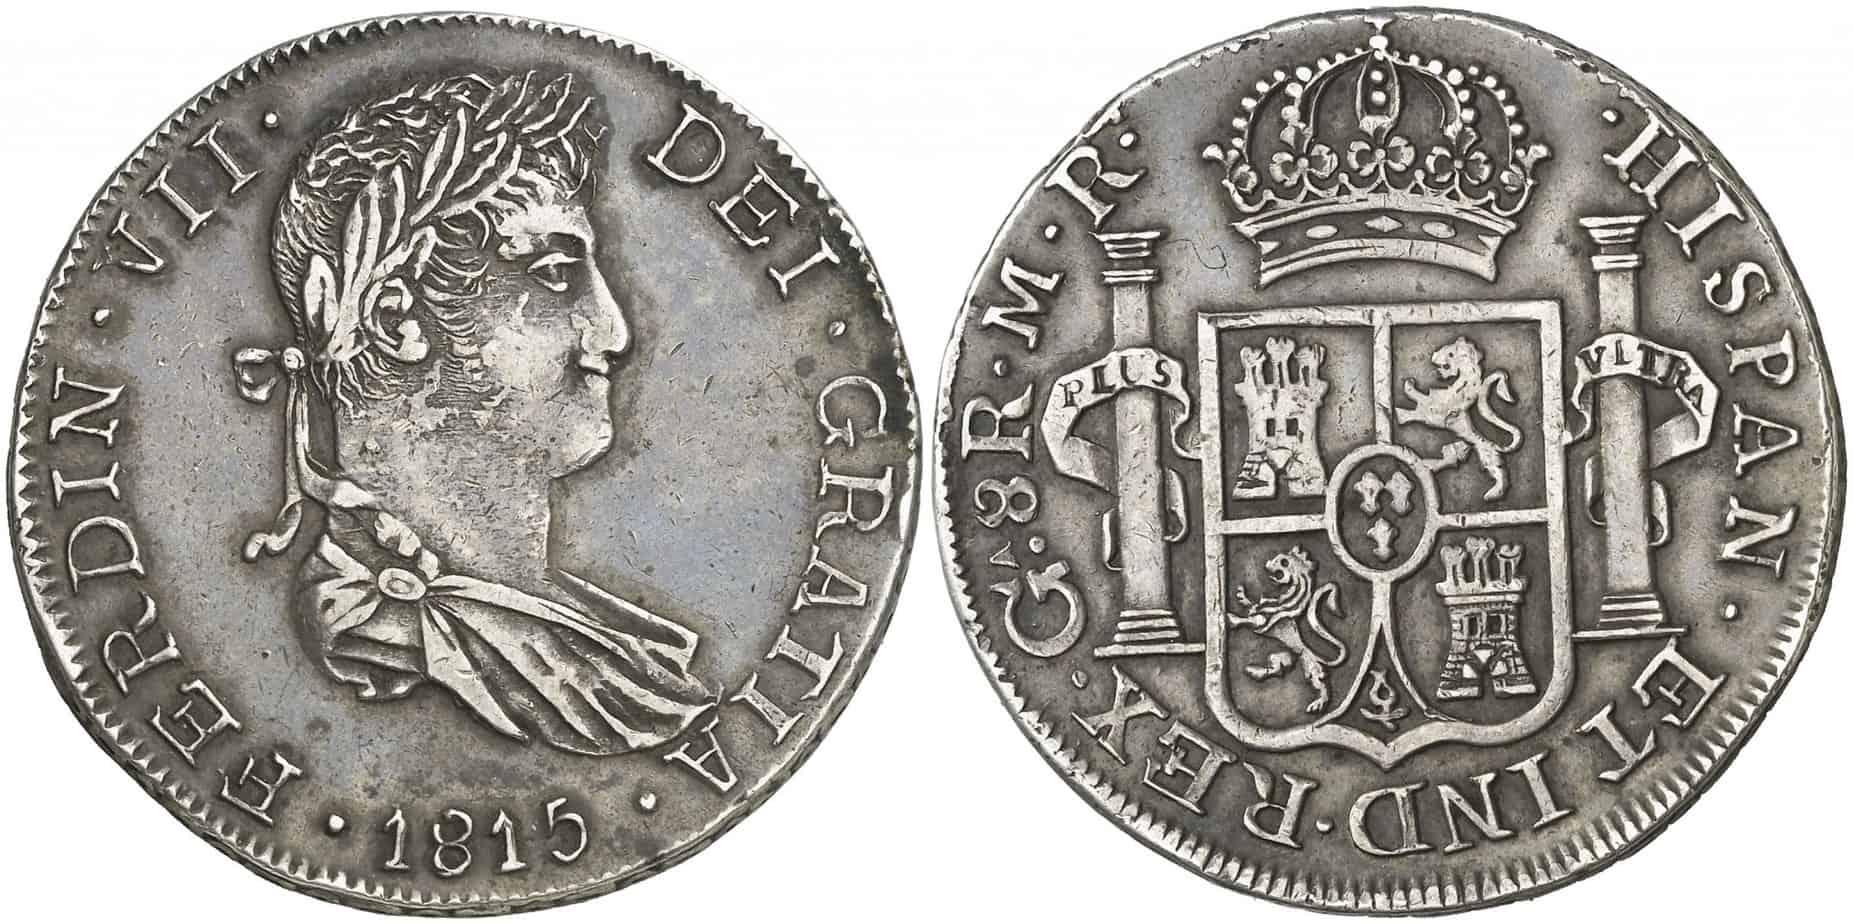 8 reales Guadelajara 1815